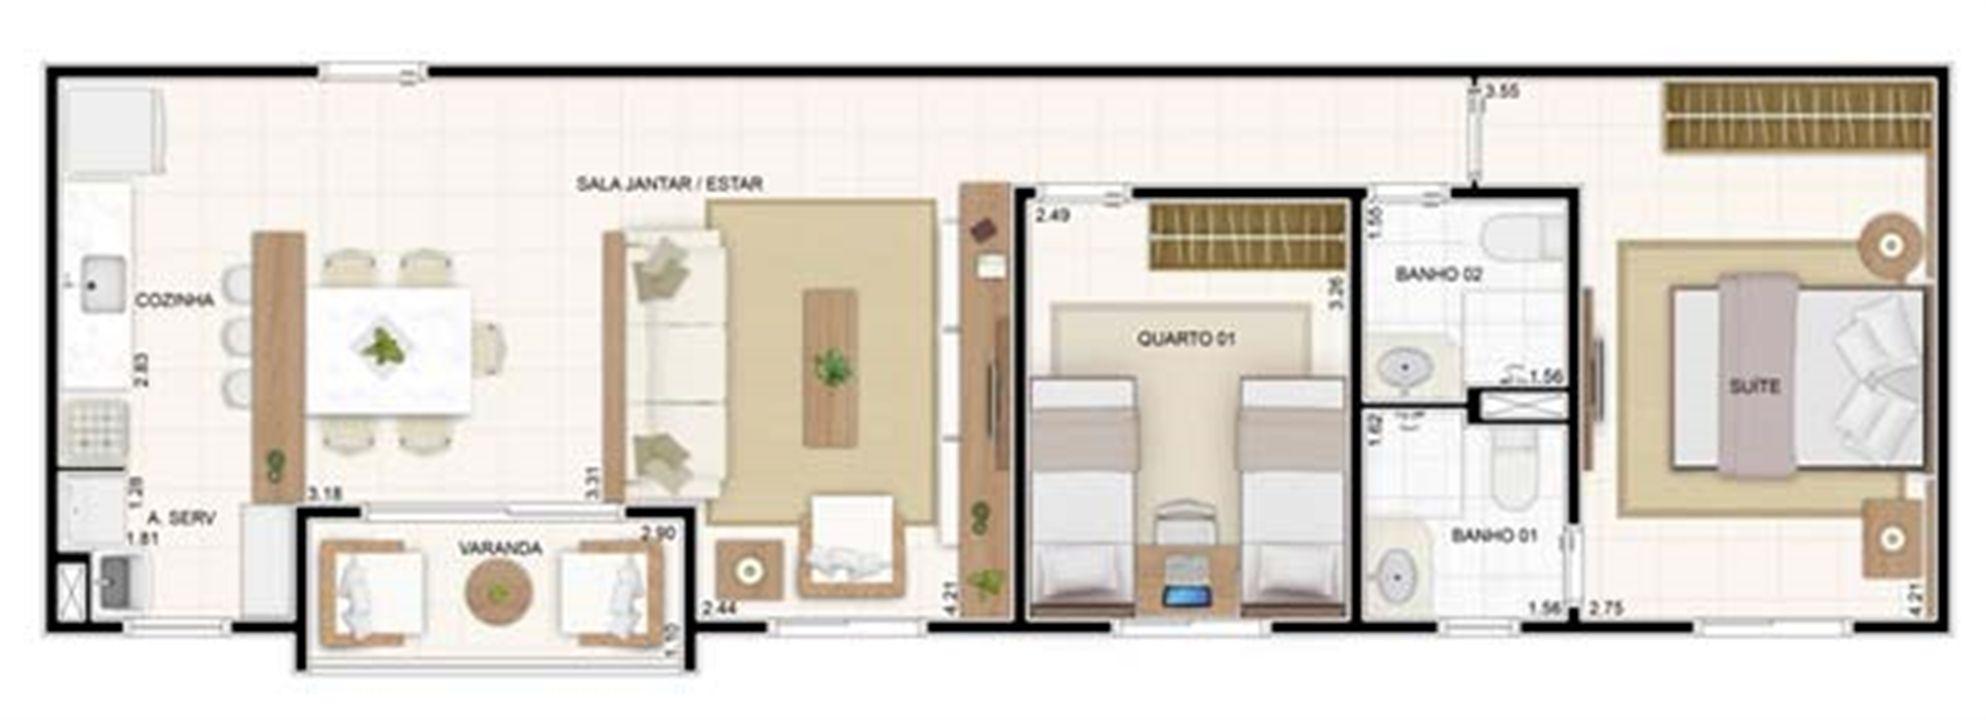 3 dorms Sala Ampliada 67,35m² | Vita 2 Residencial Clube – Apartamentono  Pitimbu - Natal - Rio Grande do Norte